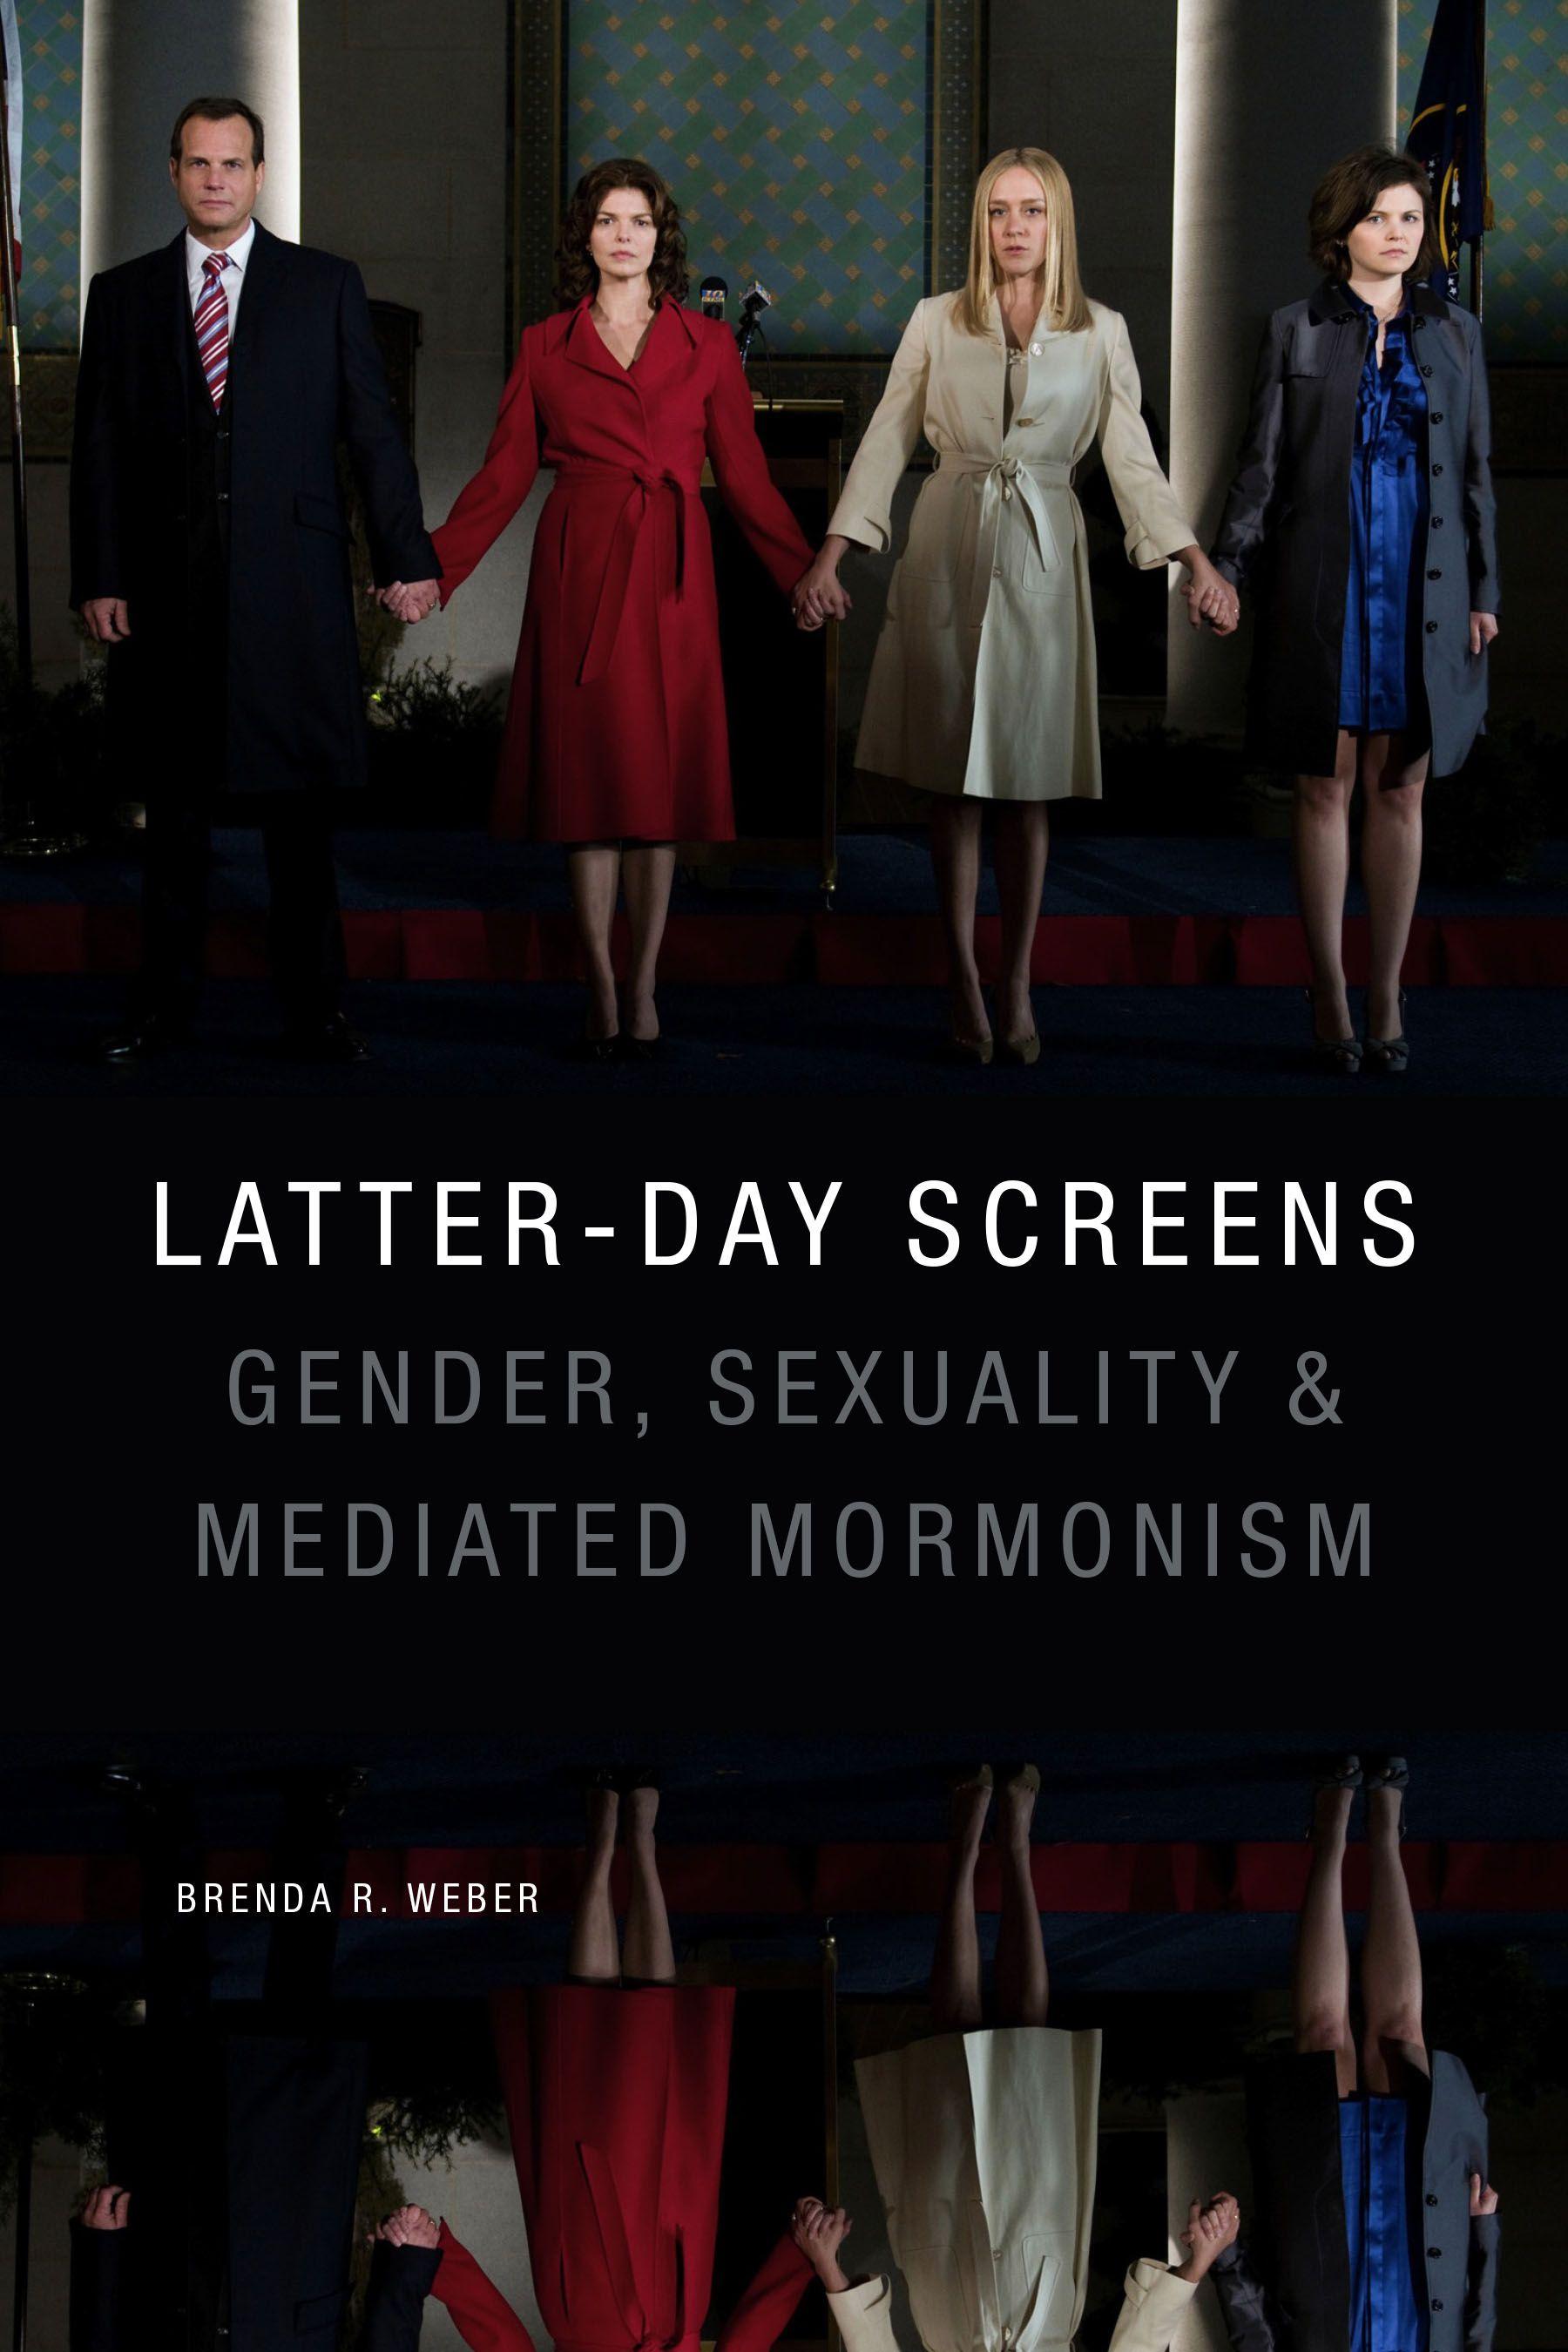 Latterday screens by brenda r weber new books latter